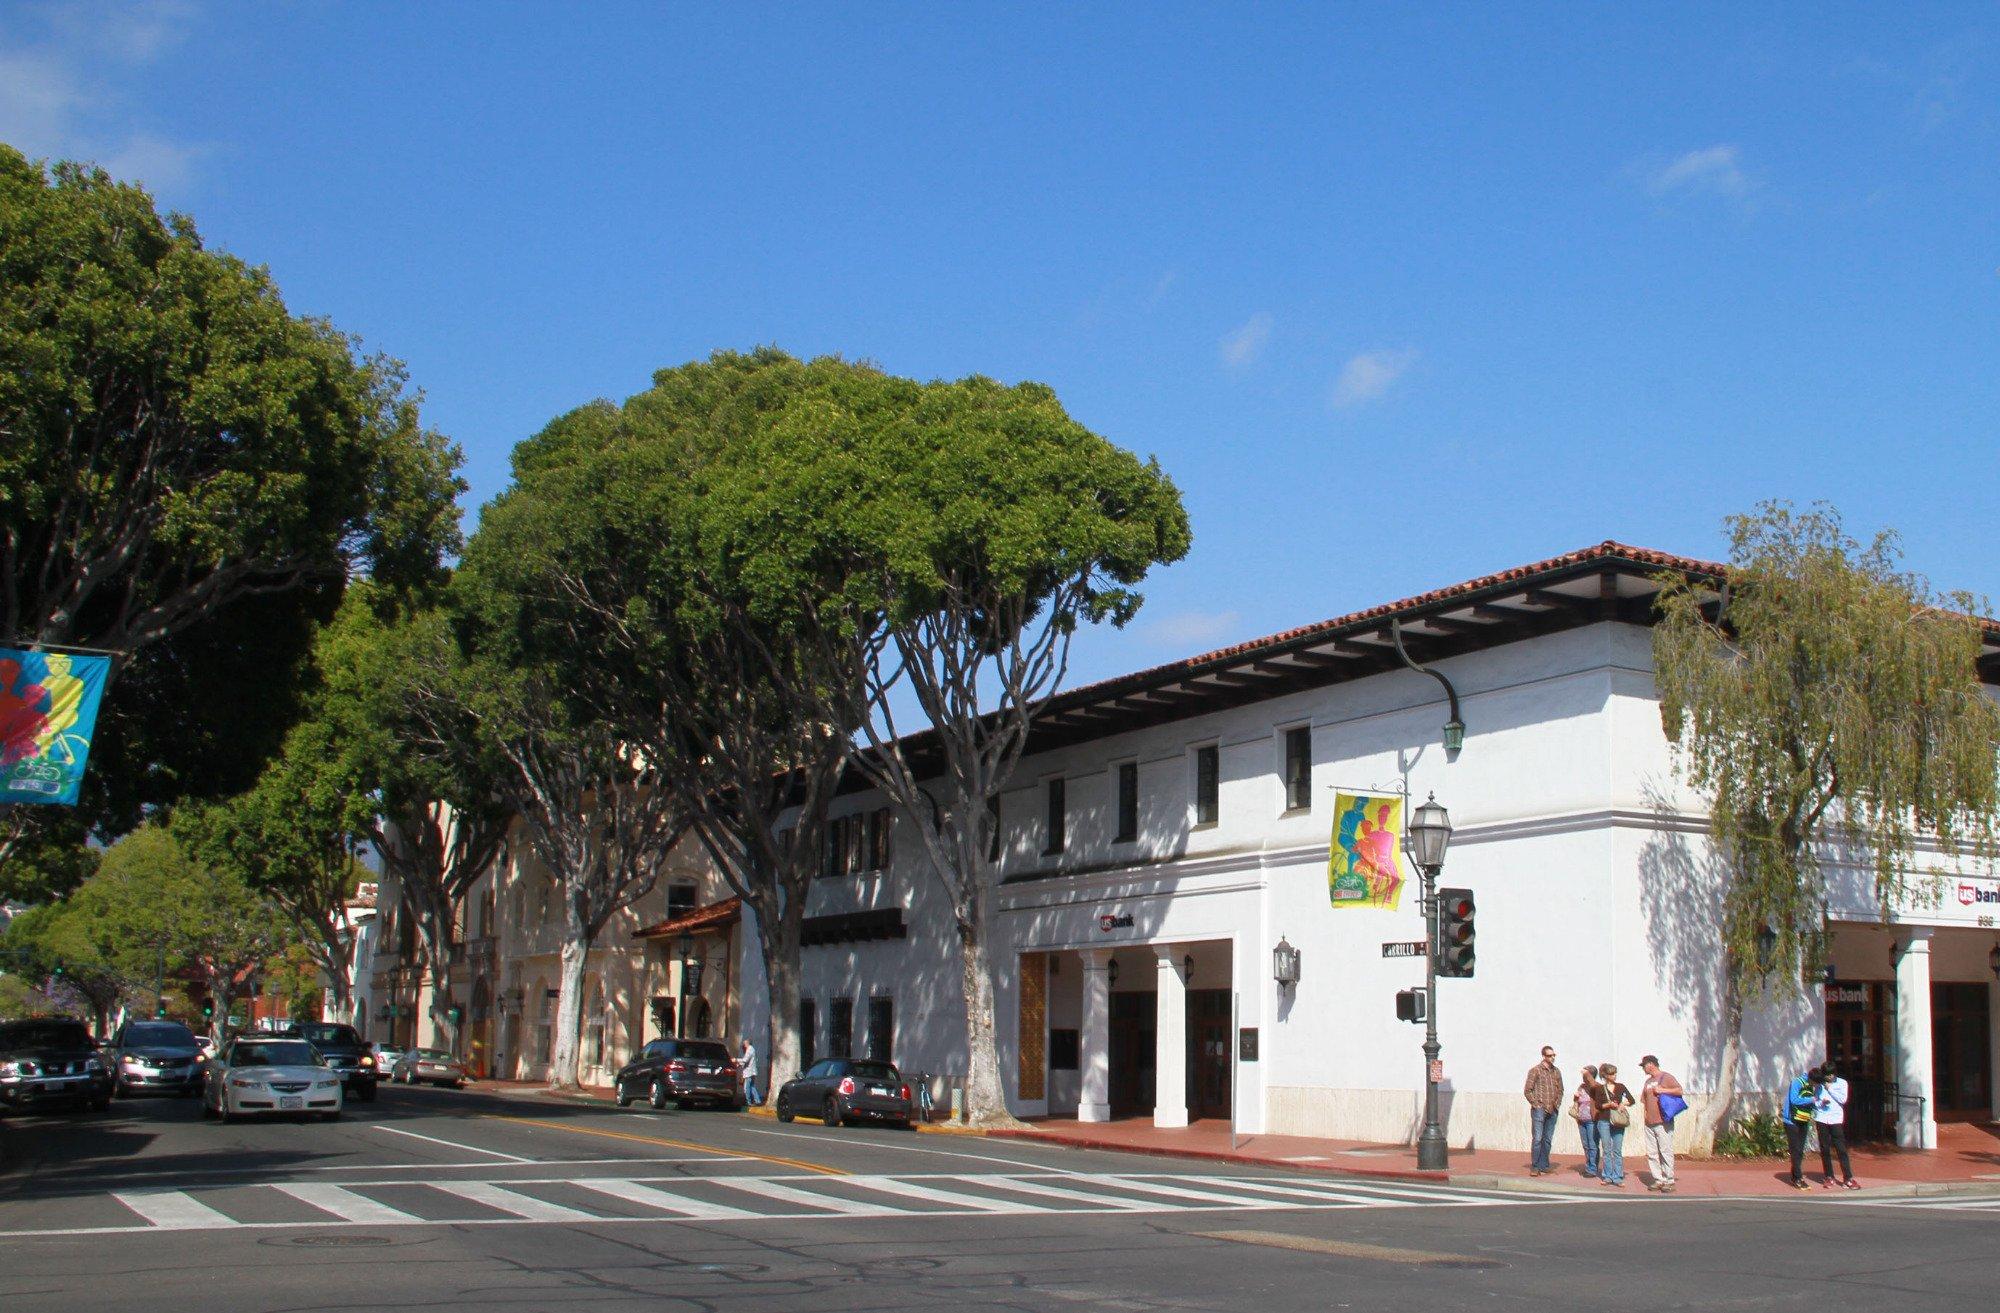 Down town Santa Barbara